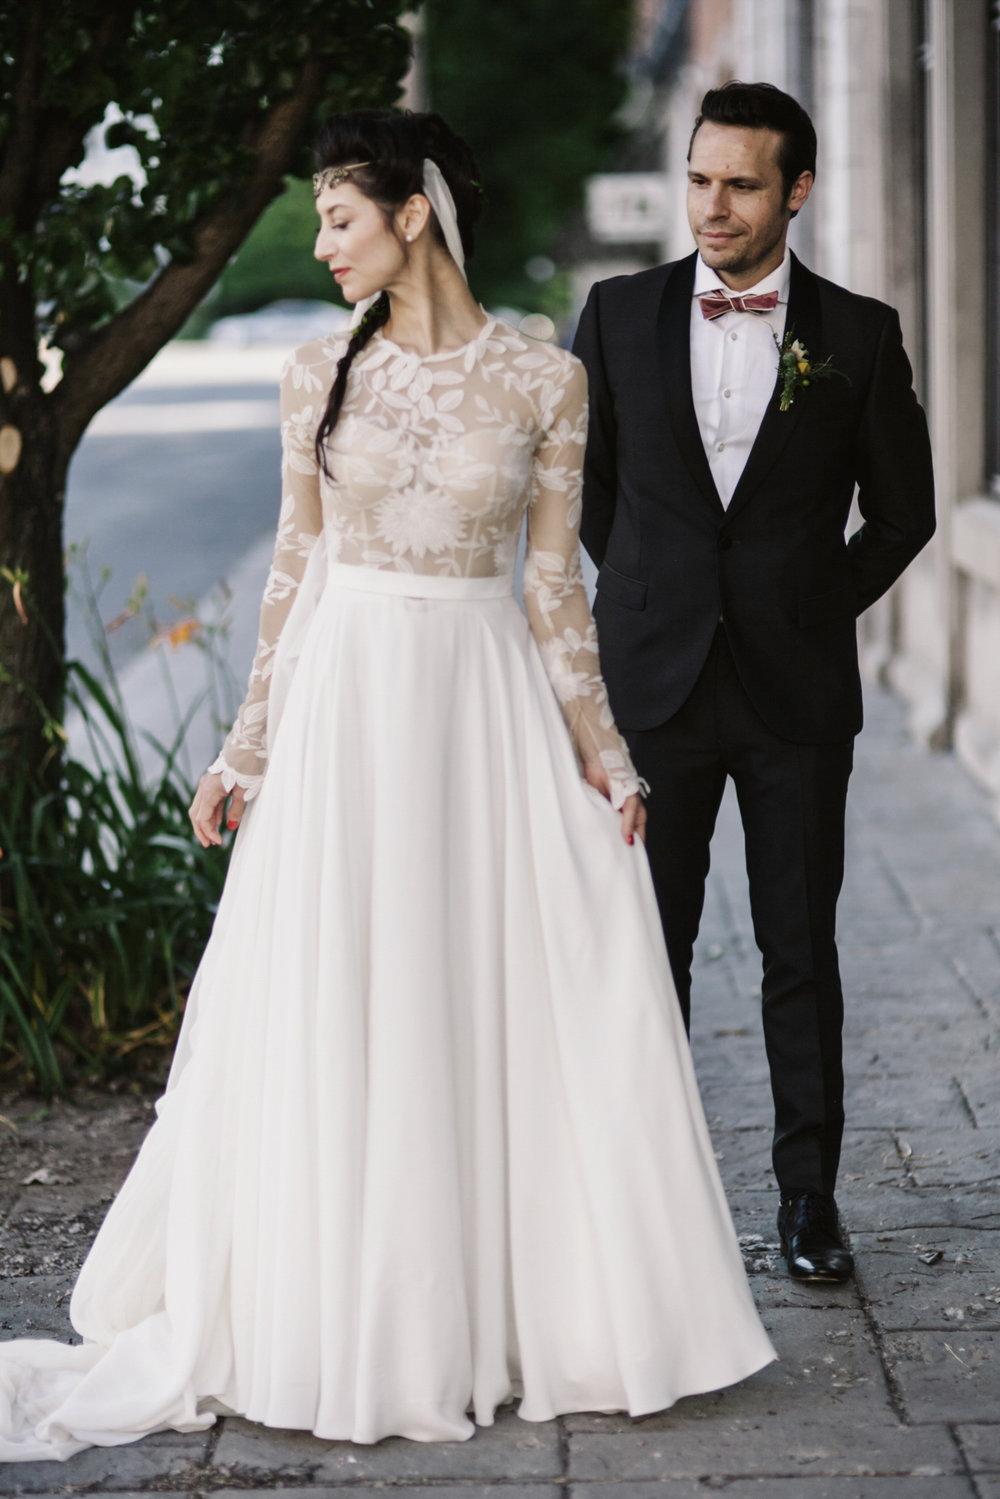 Kimberly-Coccagnia-Wedding-Photographer-151.JPG